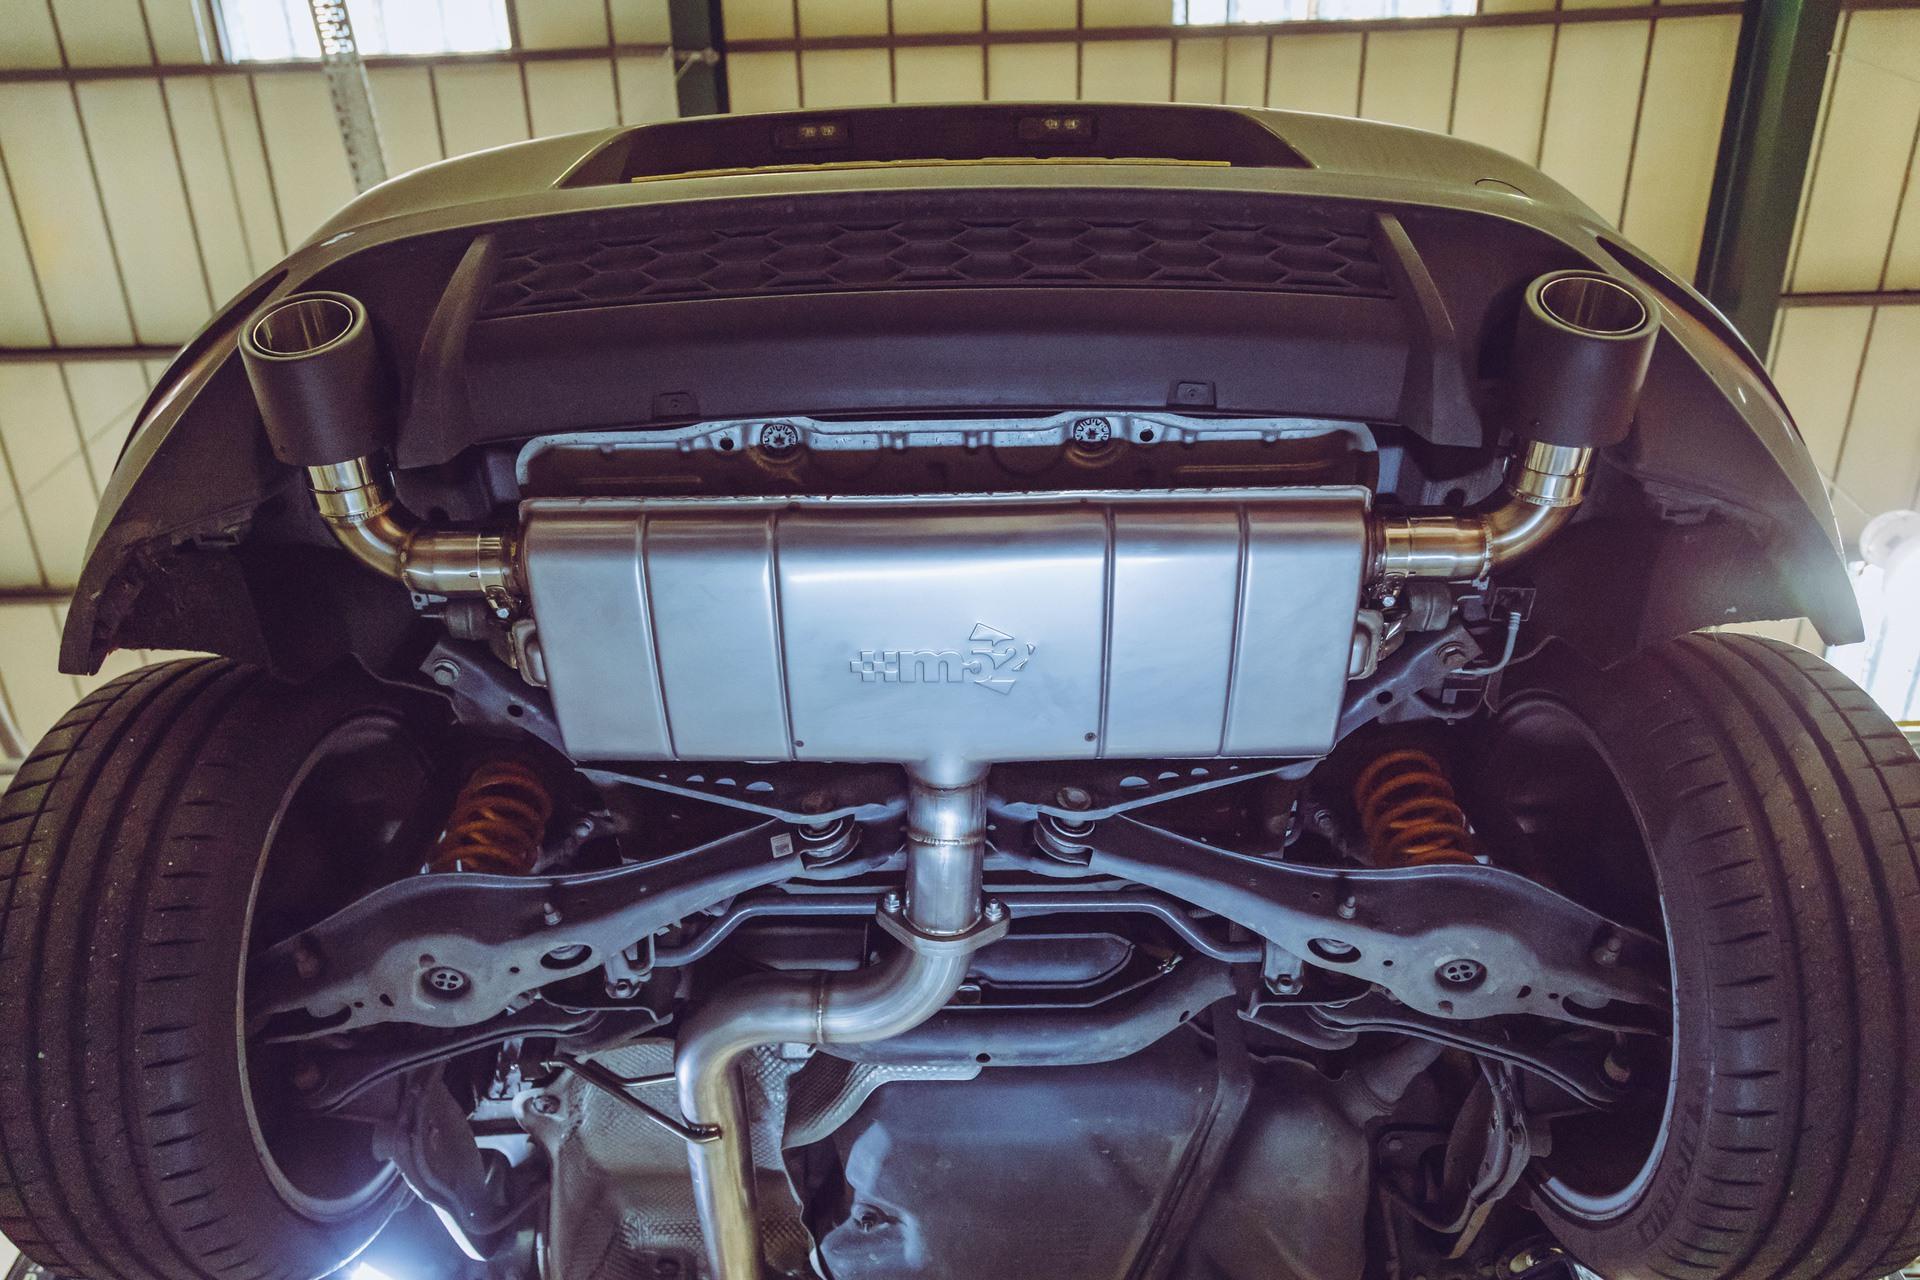 VW_Golf_GTI_Mk7_Mountune_exhaust_0015